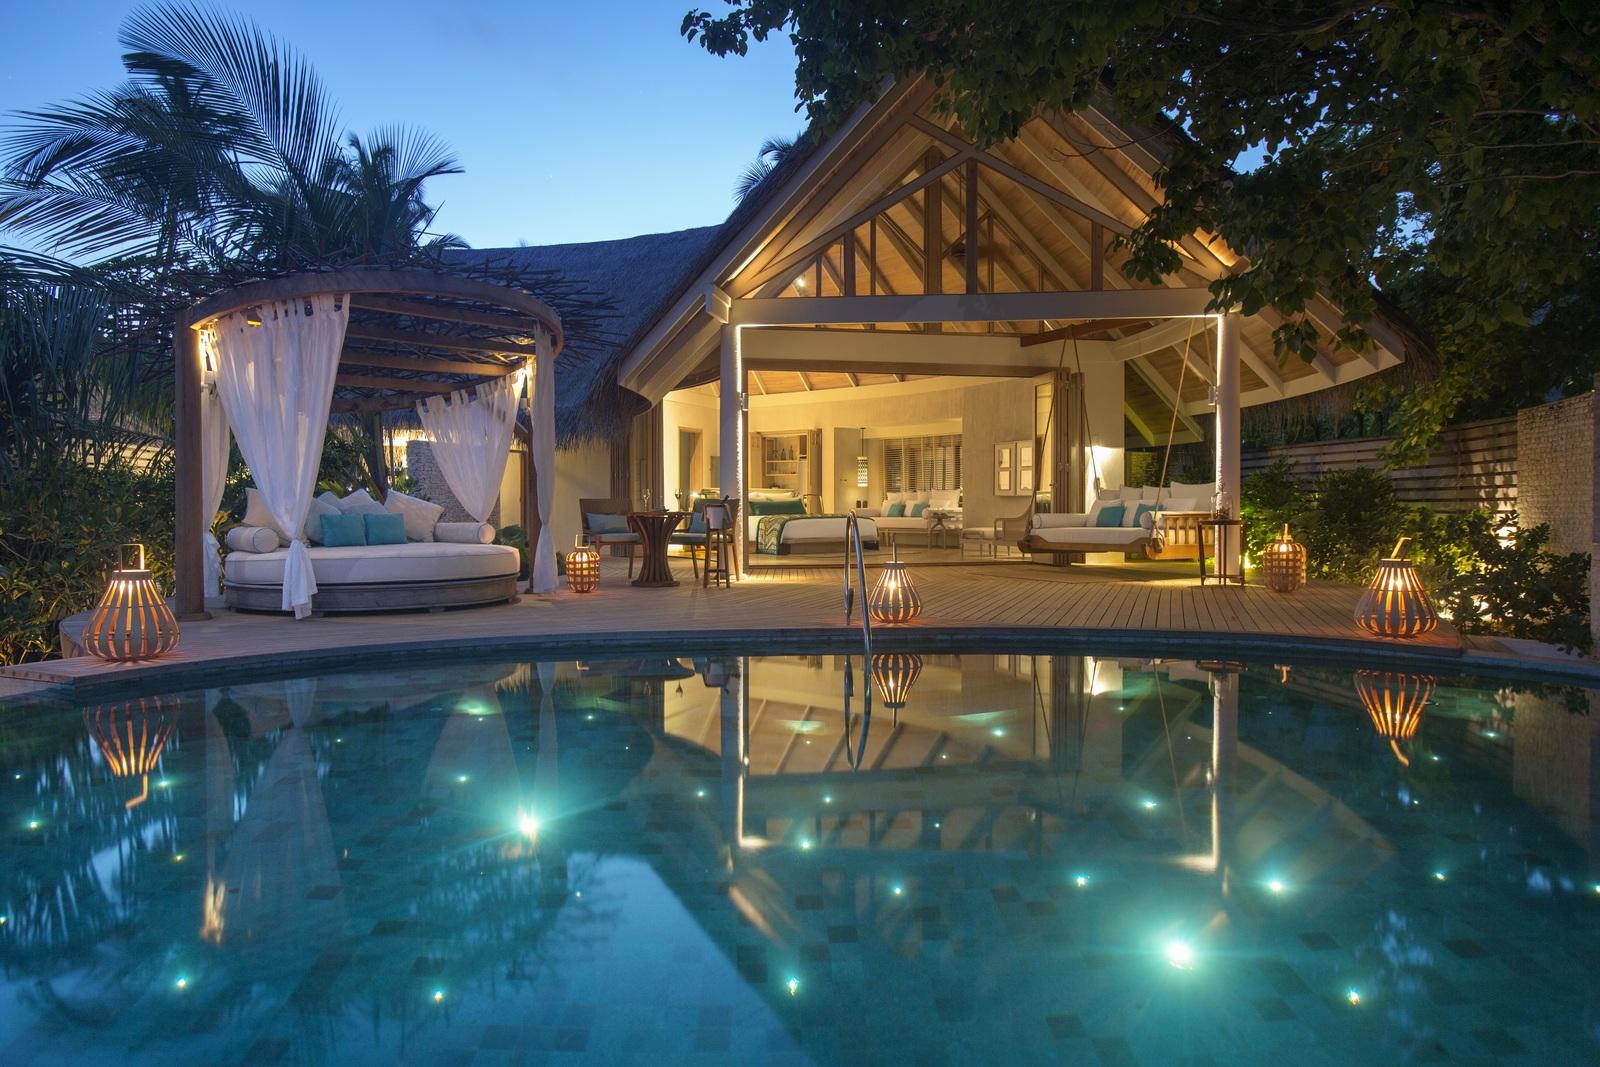 Malediven    die neue Trauminsel Milaidhoo im Baa Atoll strand sonne reisebericht malediven honeymoon 2  TUI Berlin Reisebüro Malediven Milaidhoo Island Beachvilla Abendstimmung